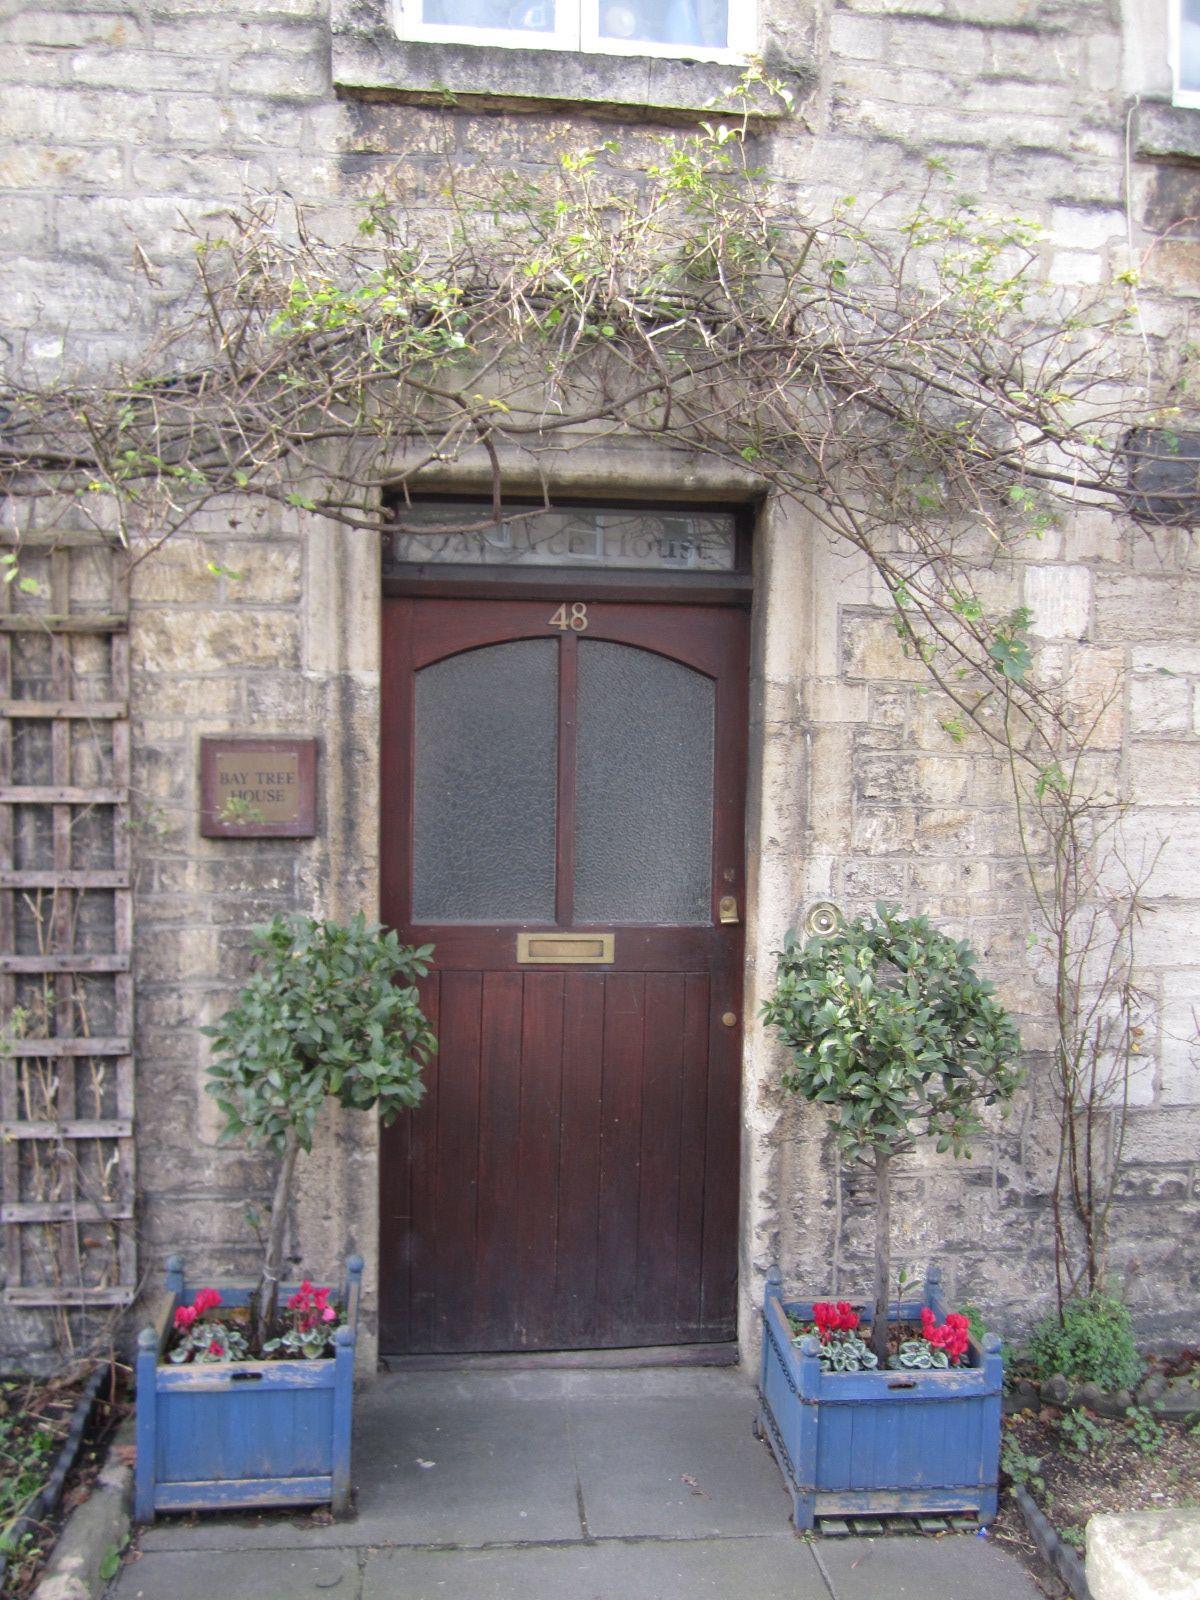 Bradford Upon Avon. AvonDoorsGates & Bradford Upon Avon   Doors fences gates   Pinterest   Gates pezcame.com